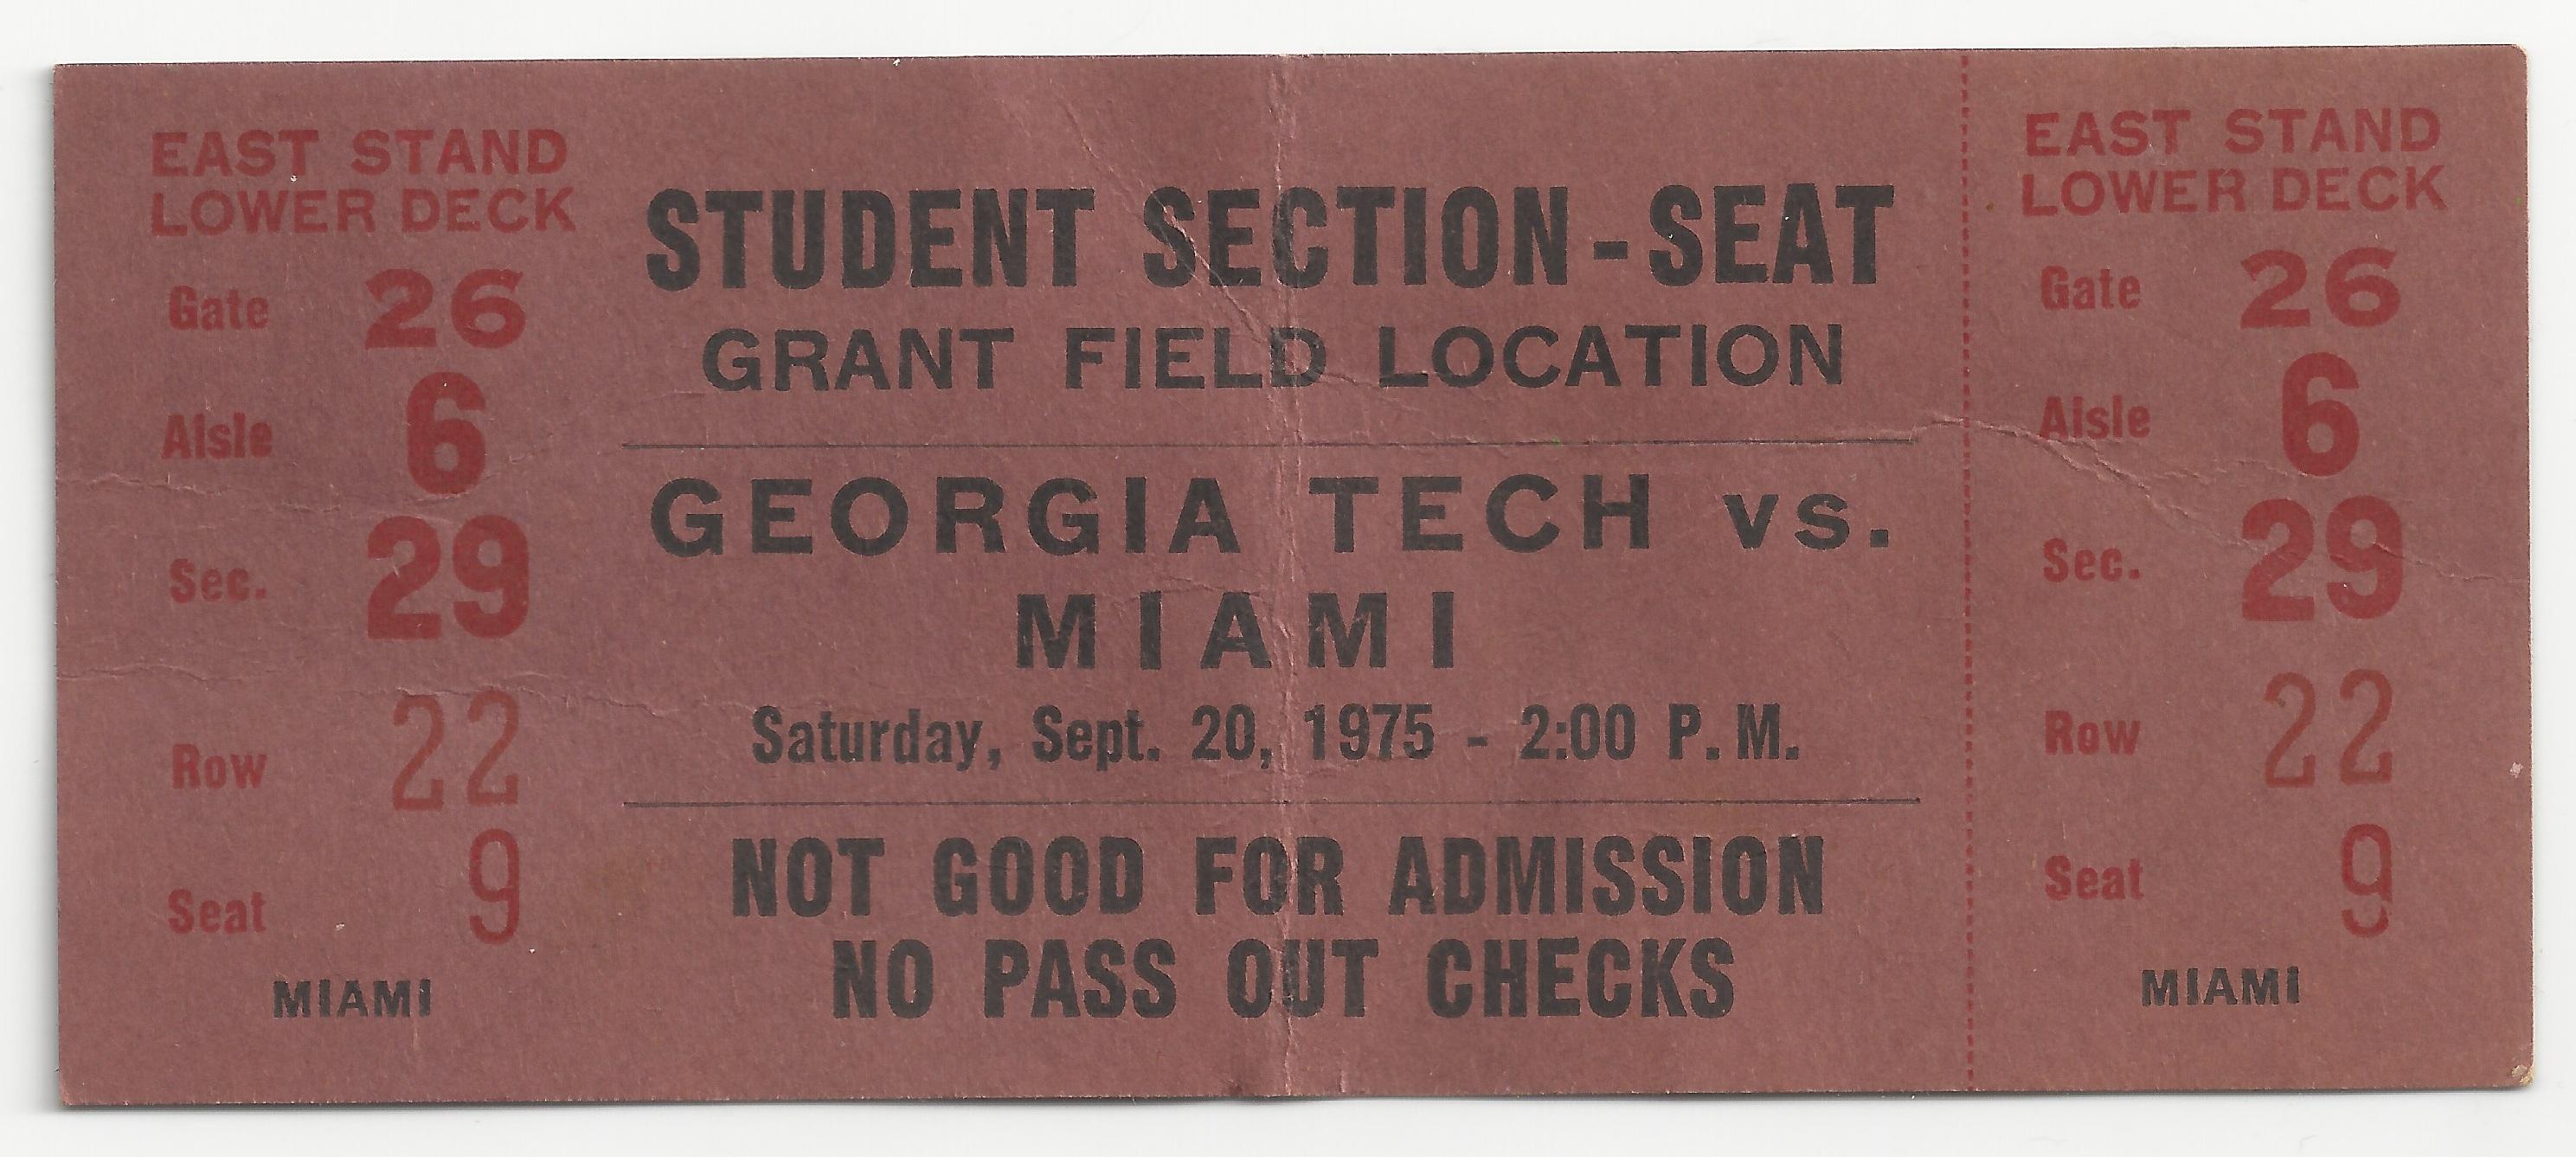 1975-09-20 - Georgia Tech vs. Miami - Student